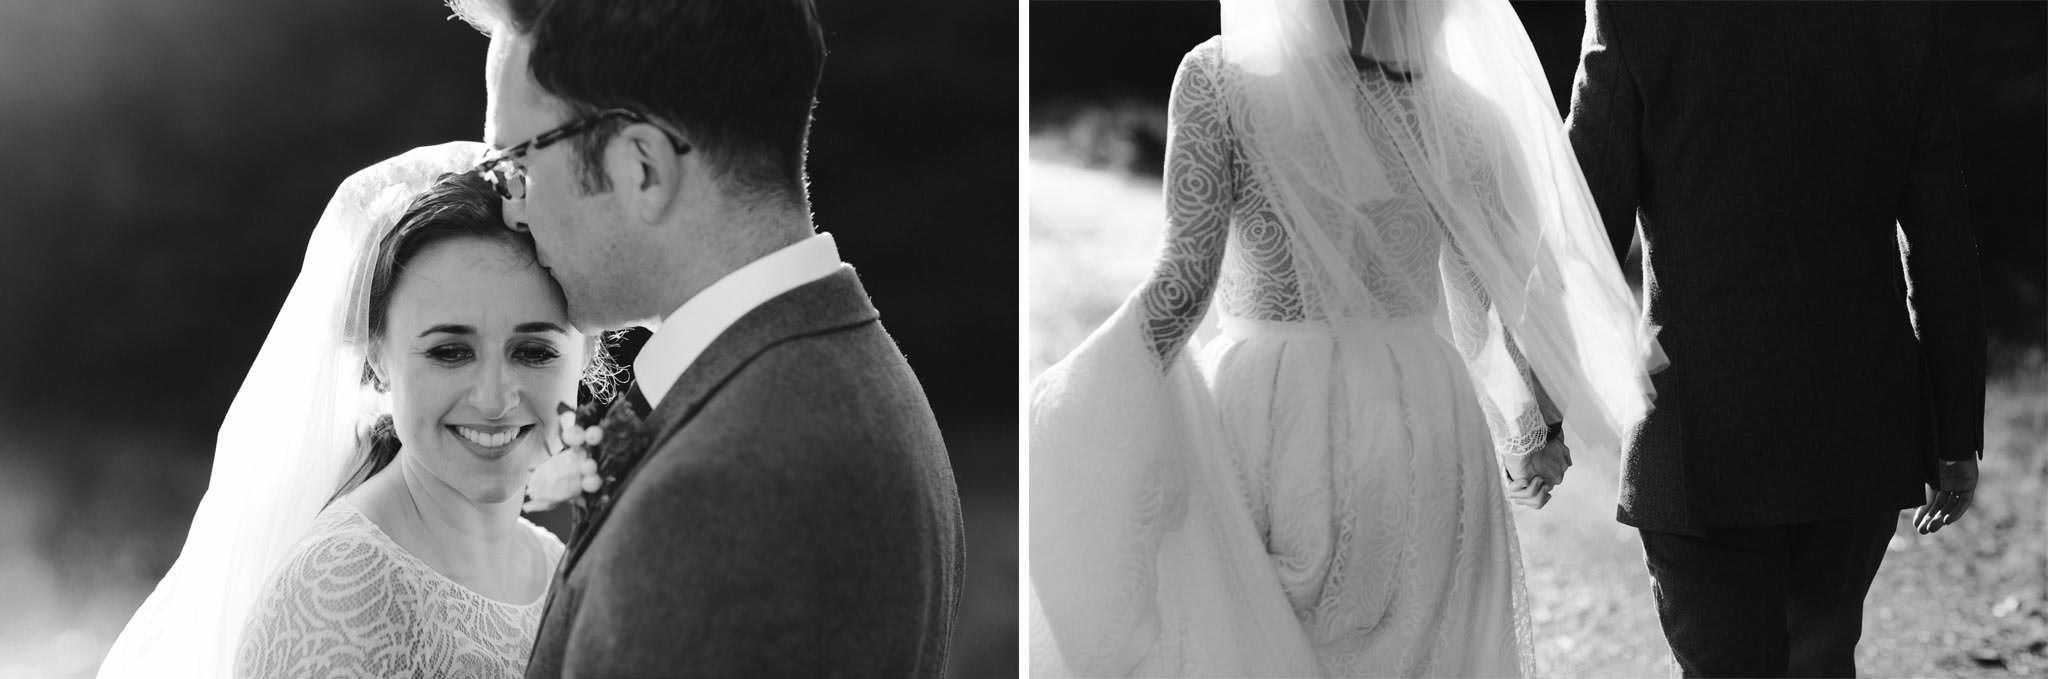 crear-wedding-photographer-059